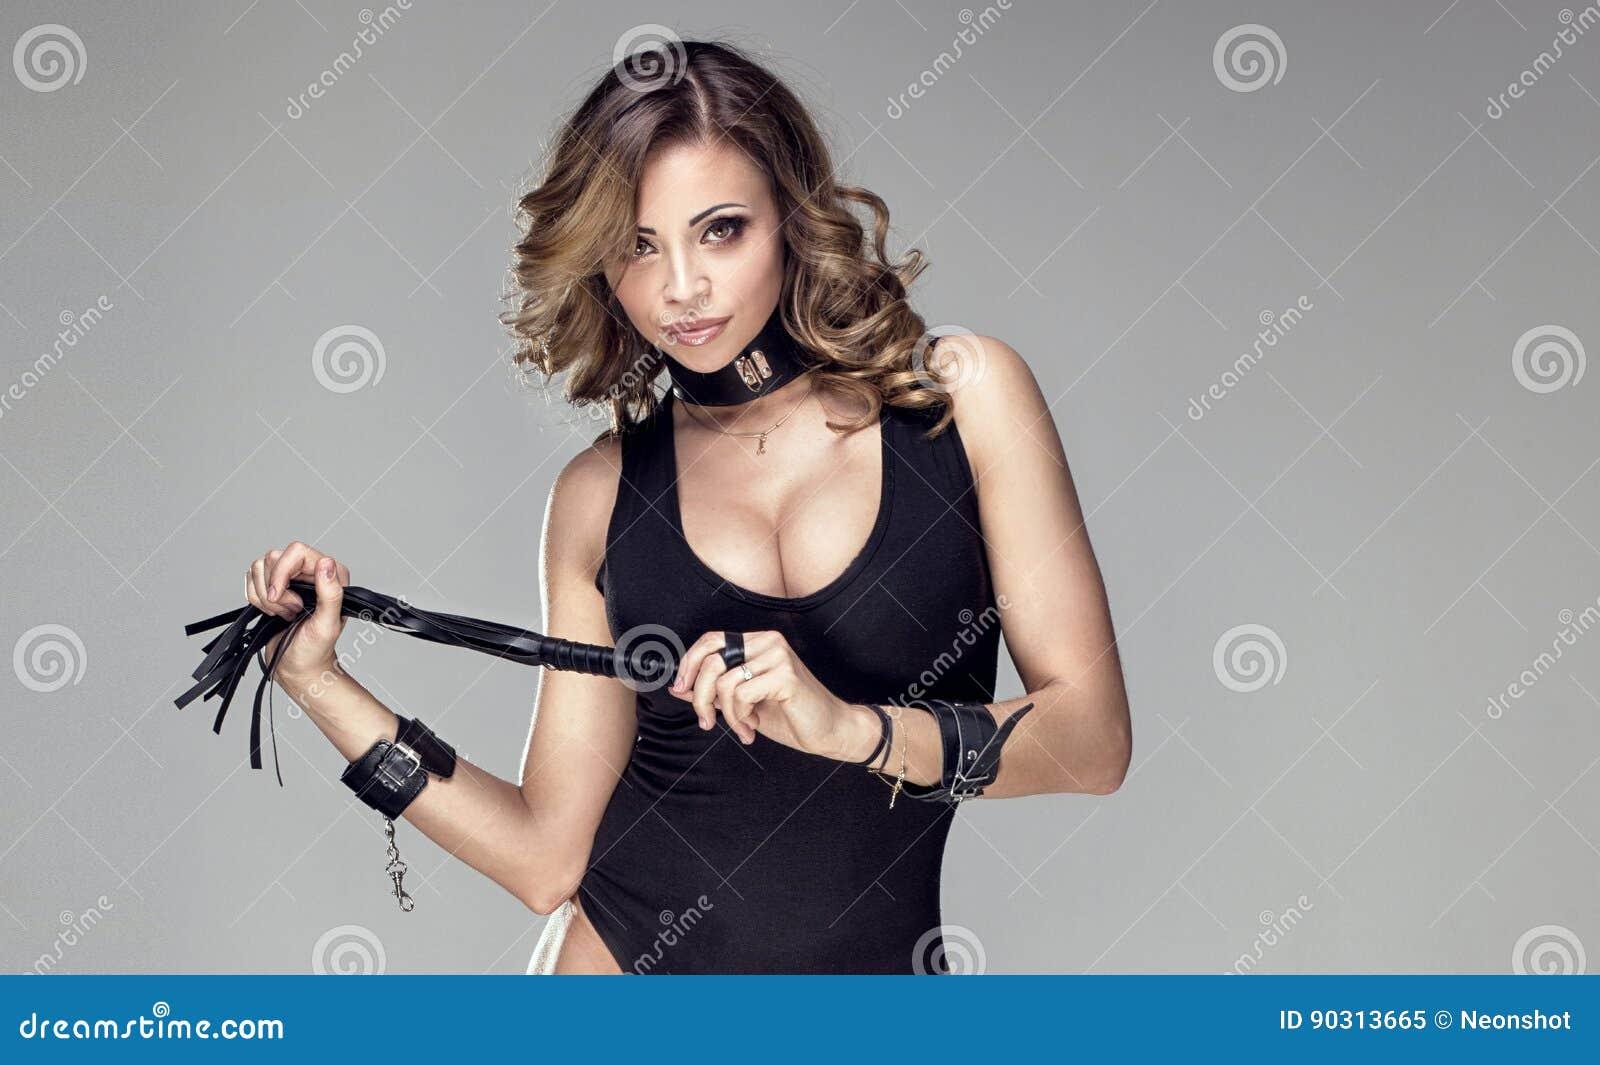 hardcore διαφυλετικός κινούμενα σχέδια πορνό